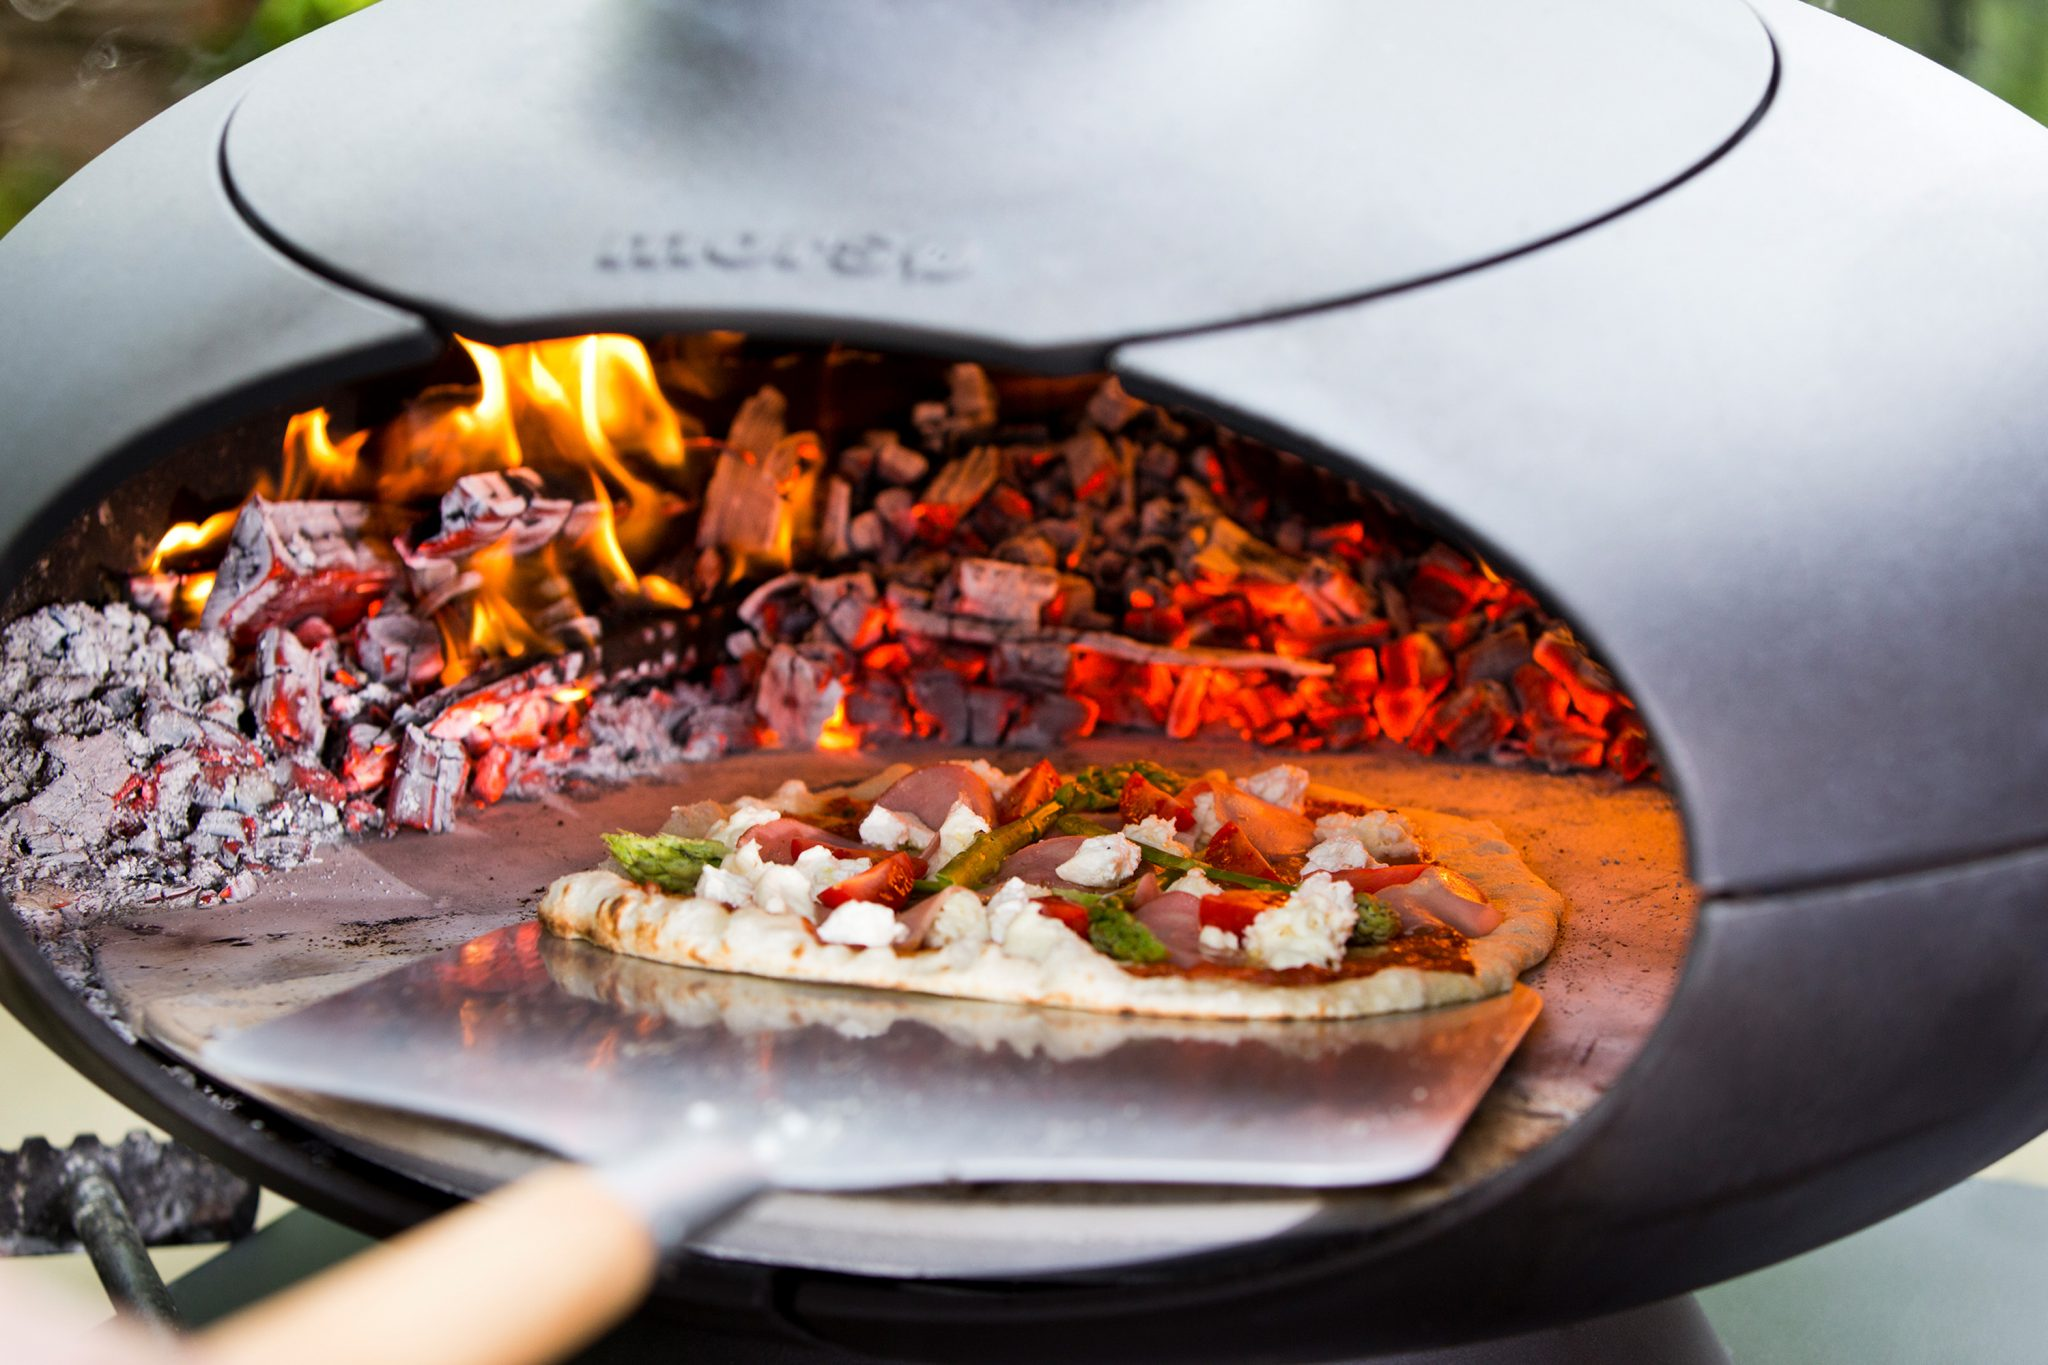 Mors 248 Alu Pizza Peel 248 Soliving The Largest Morso